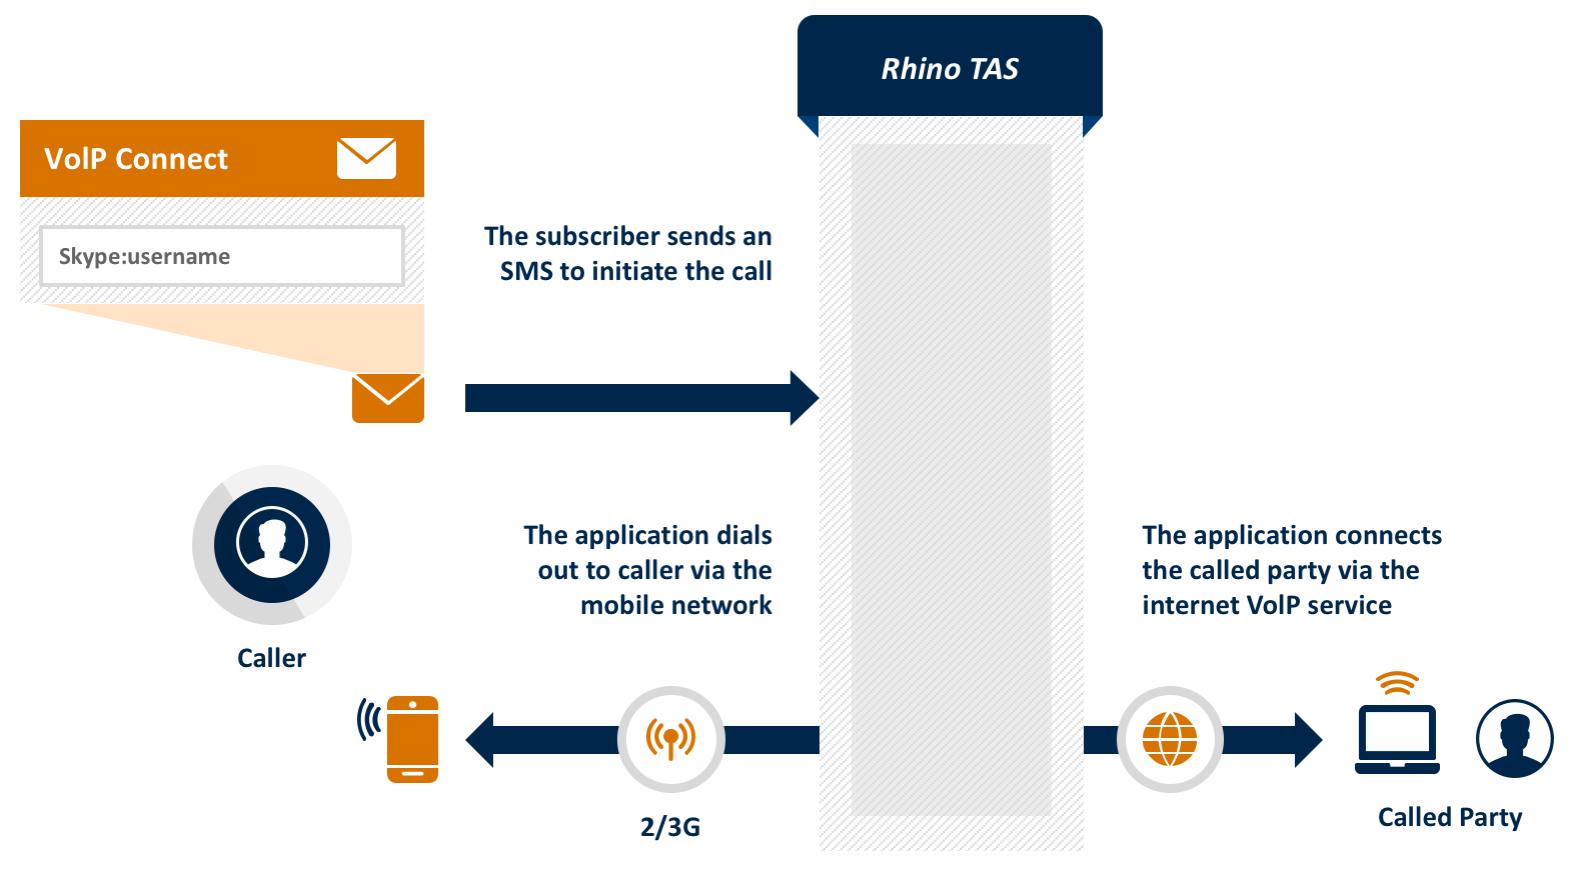 rhino-tas-app-voip-service-connect